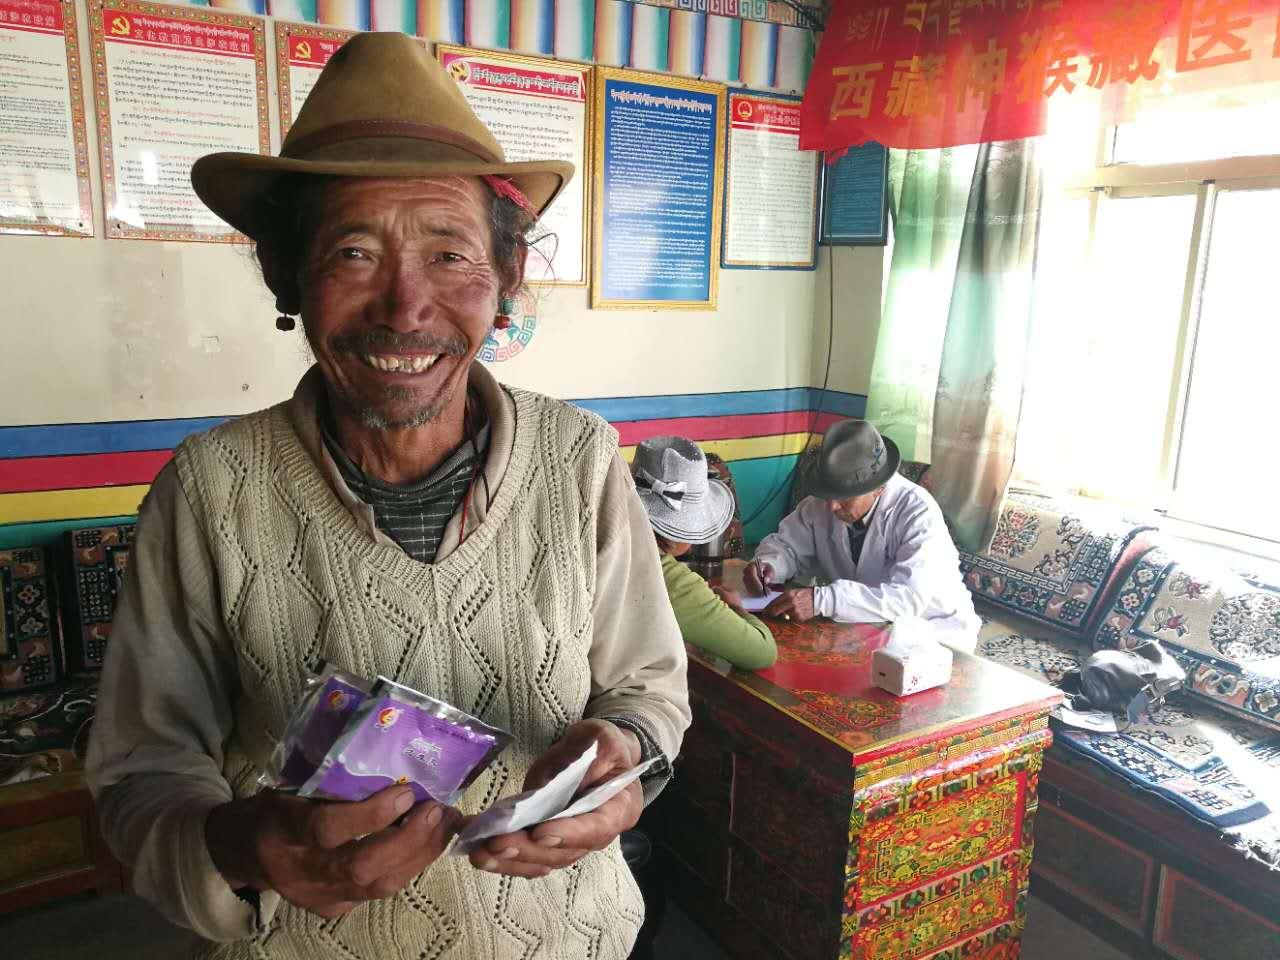 188bet怎么样神猴藏医院专家团队开展免费医疗诊治活动